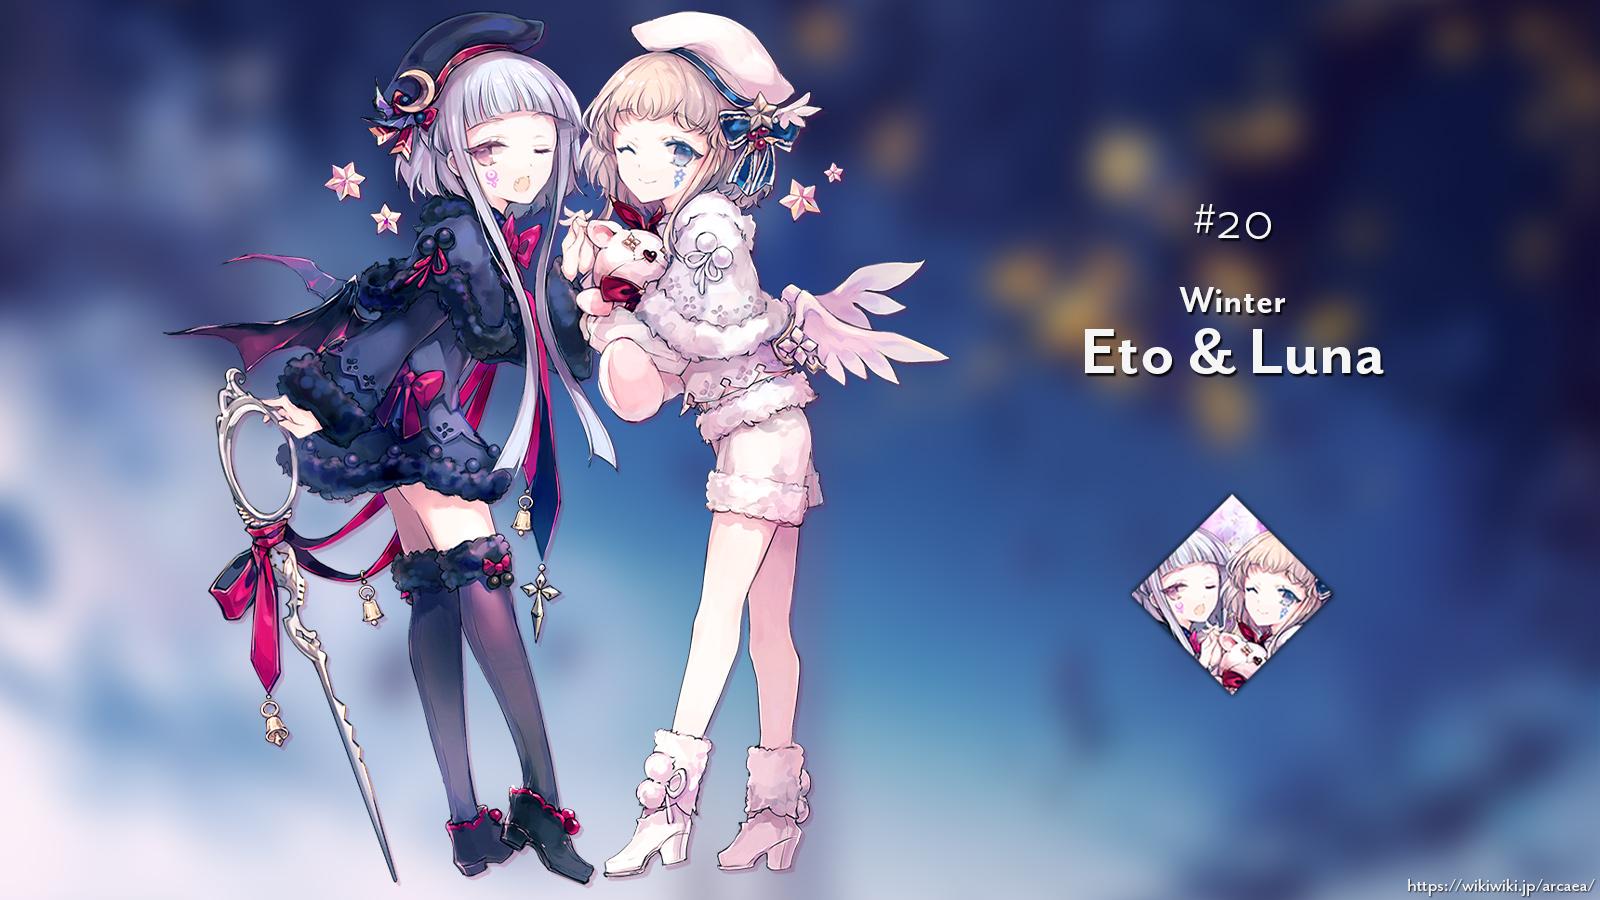 Winter Eto & Luna